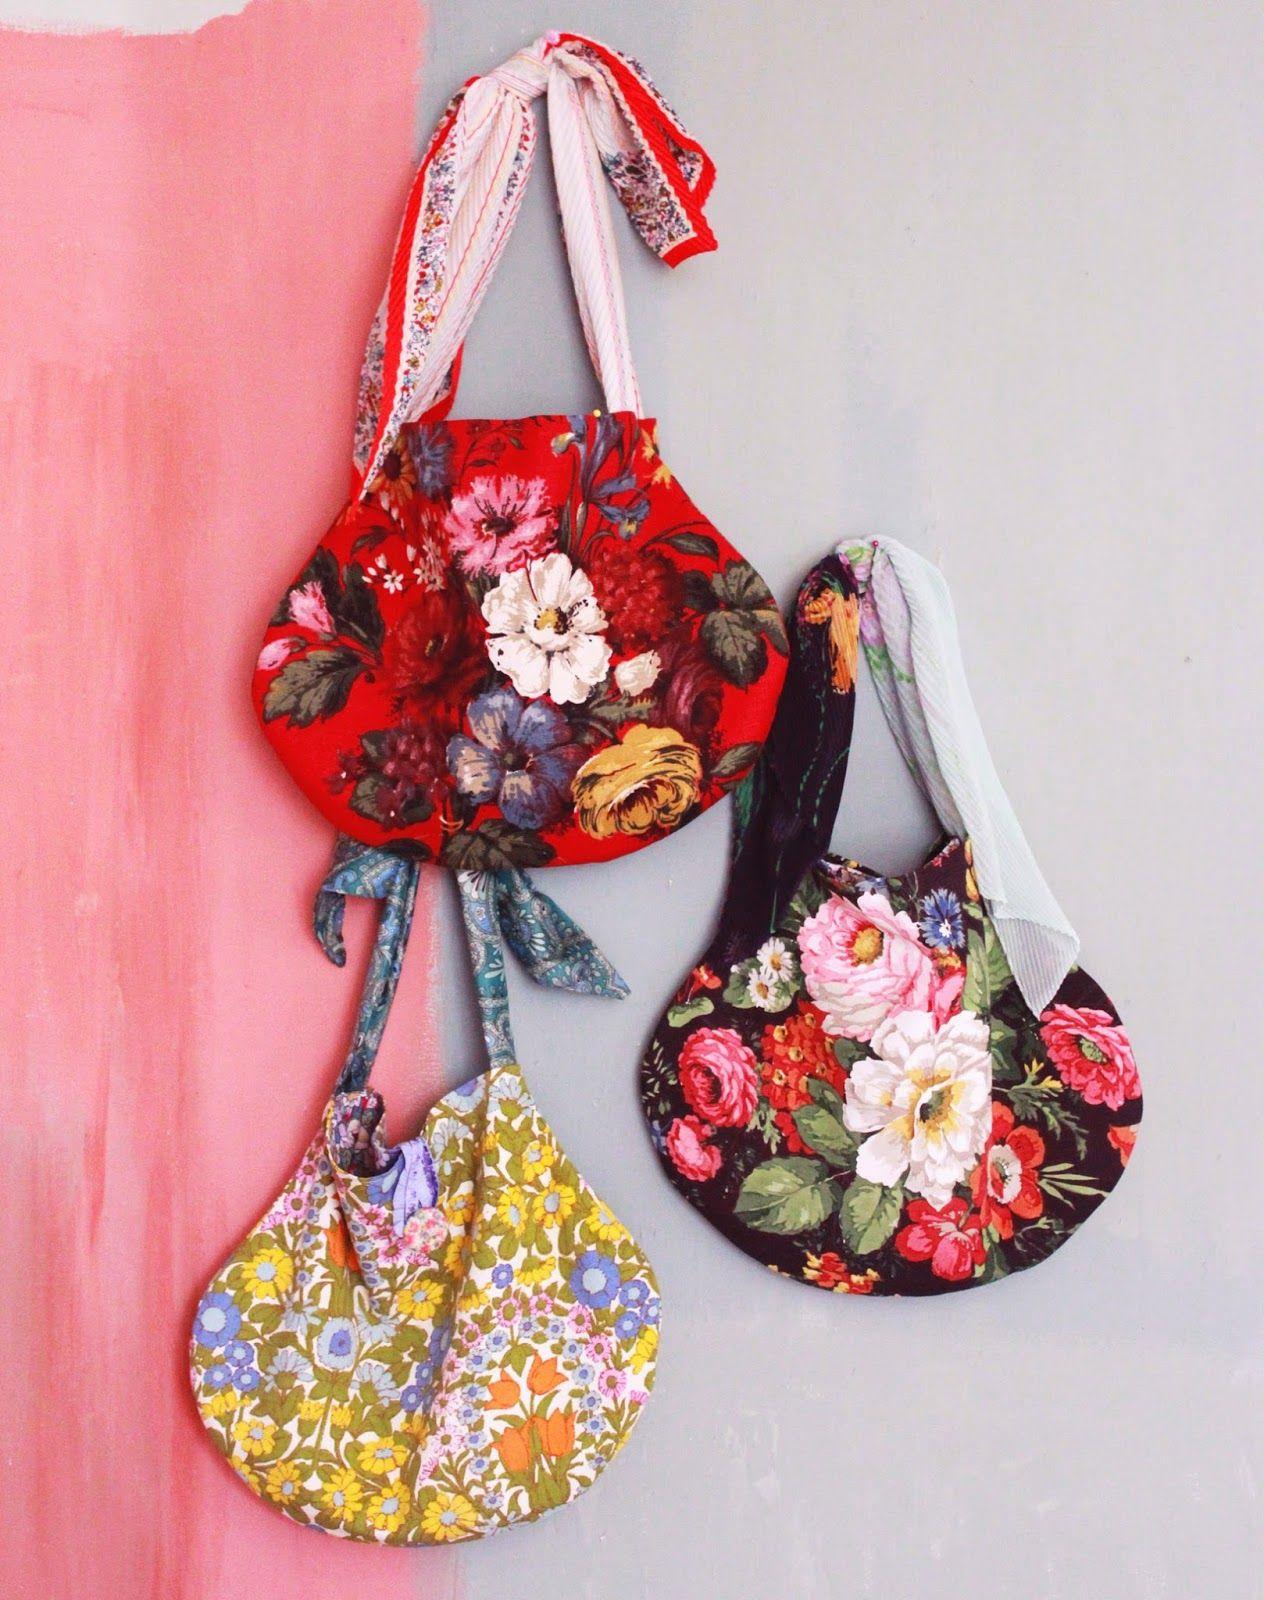 Bolsos de amor floral – Colección 2  – Bolsa